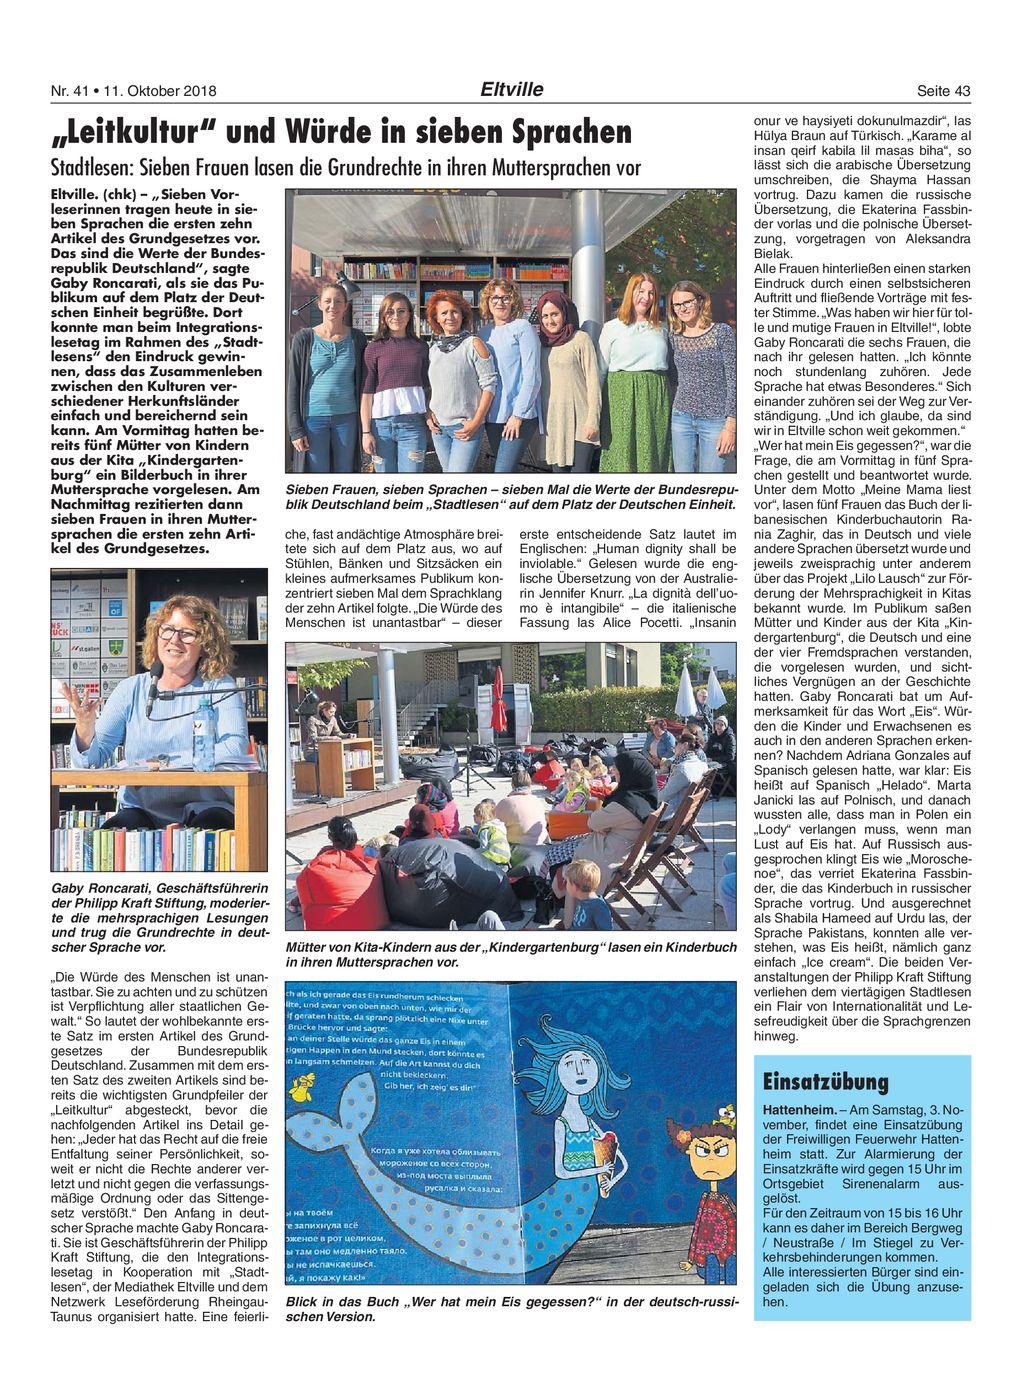 5. Oktober 2018 Rheingau Echo zum Integrationslesetag